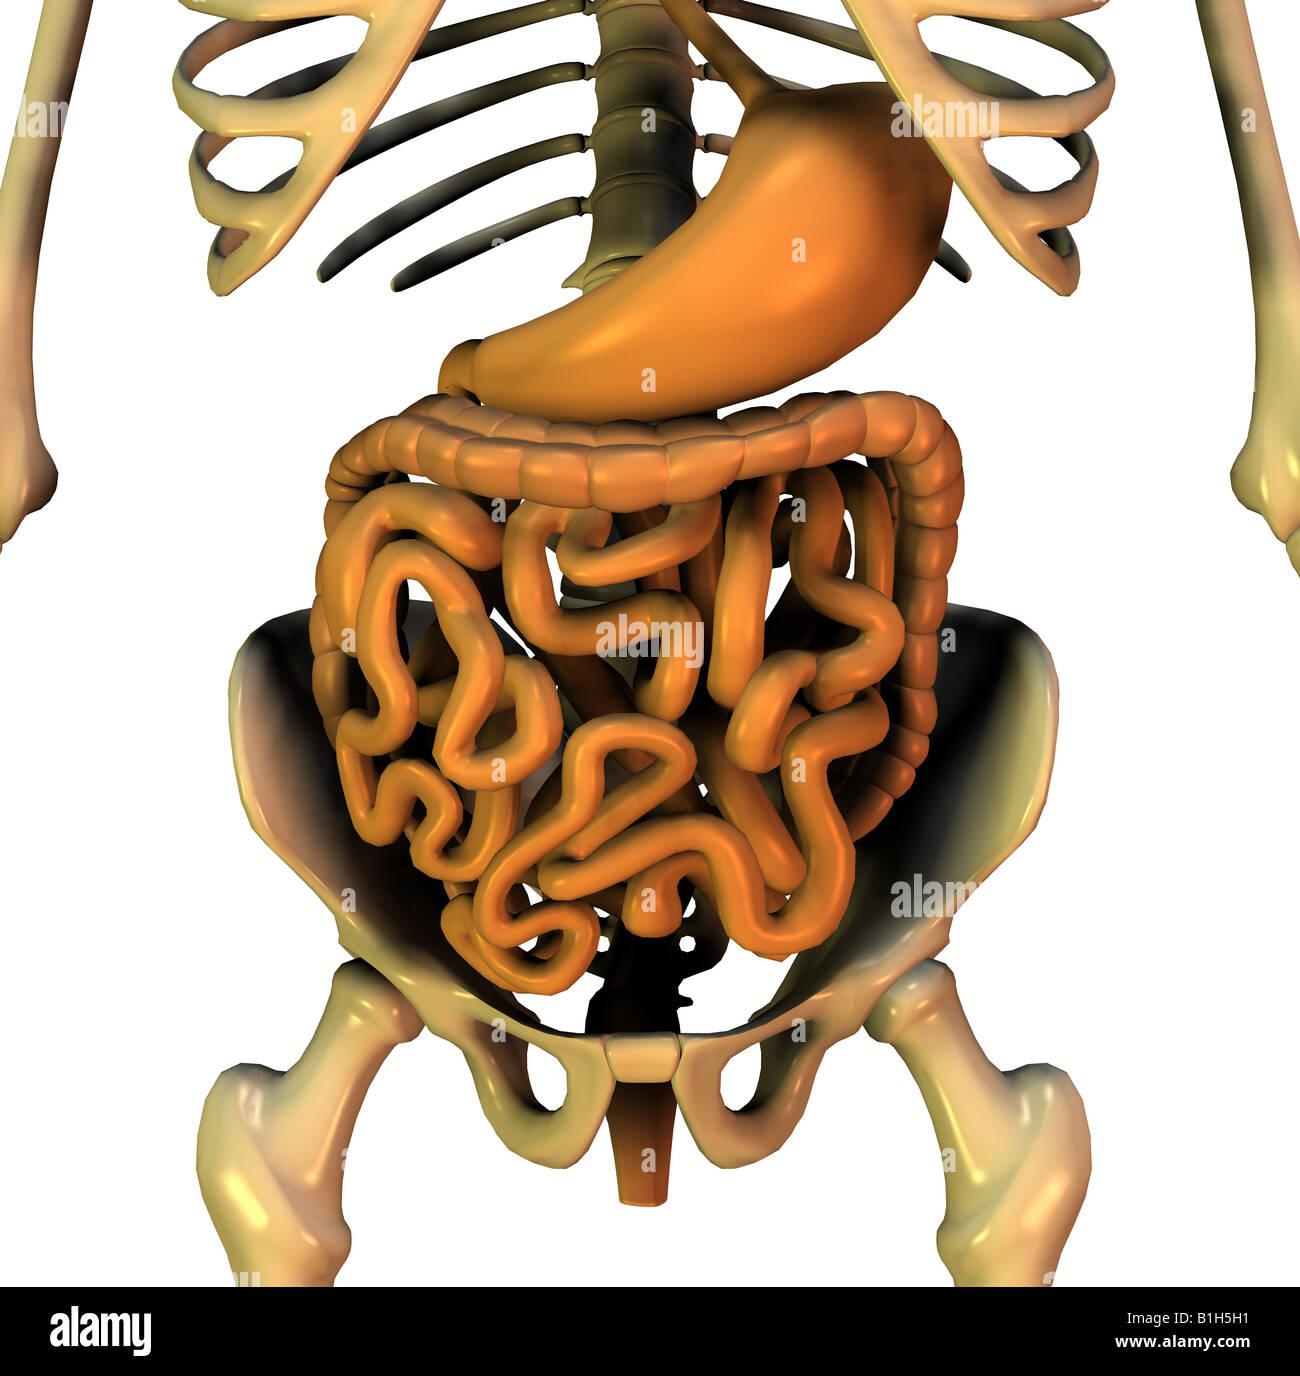 anatomy pelvic digestion Stock Photo: 18202605 - Alamy